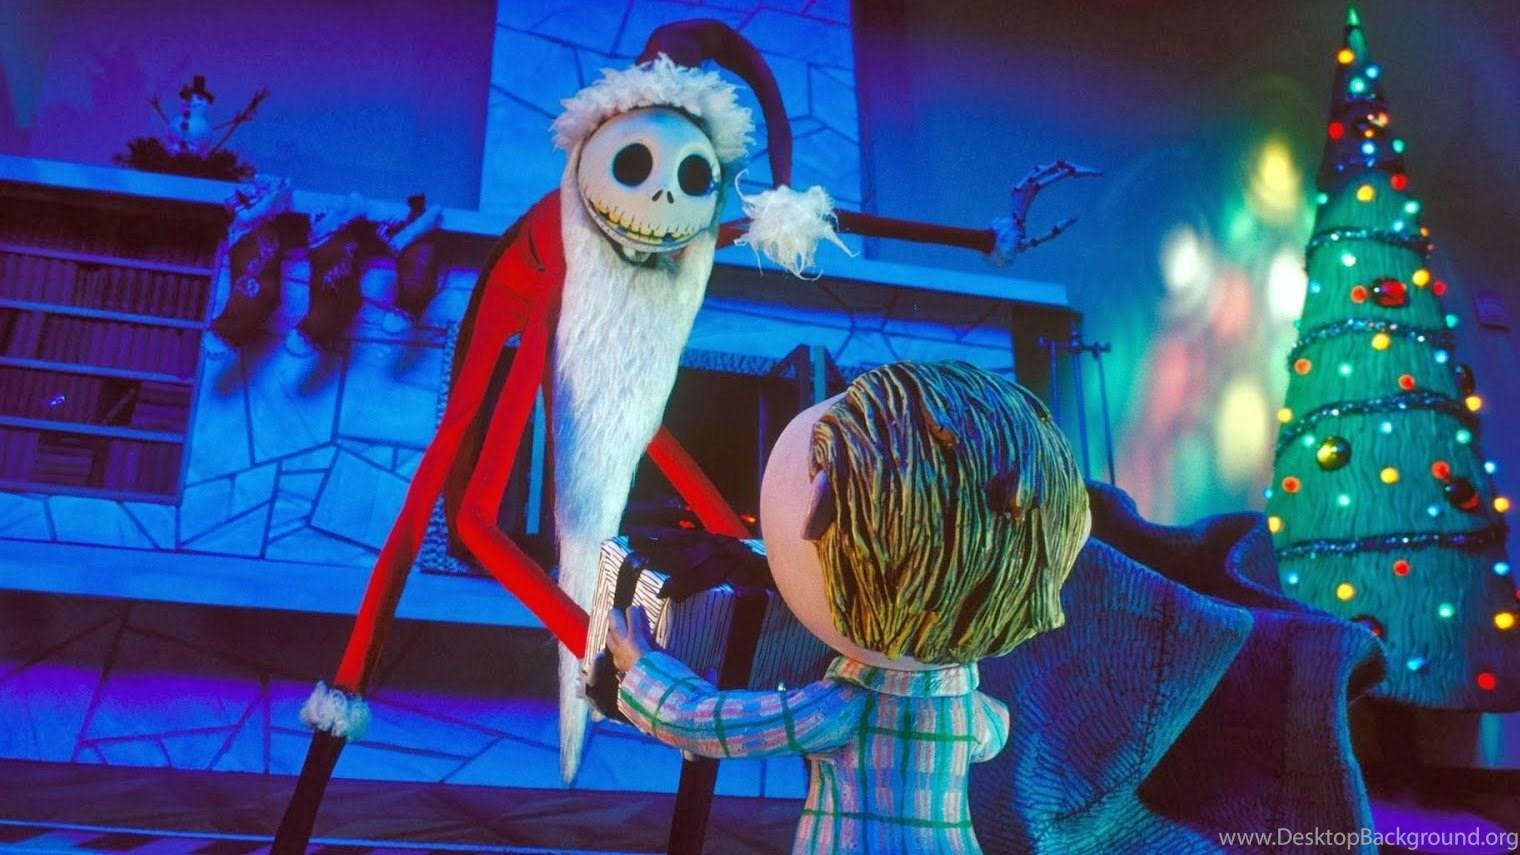 Nightmare Before Christmas Wallpapers Hd Desktop Background